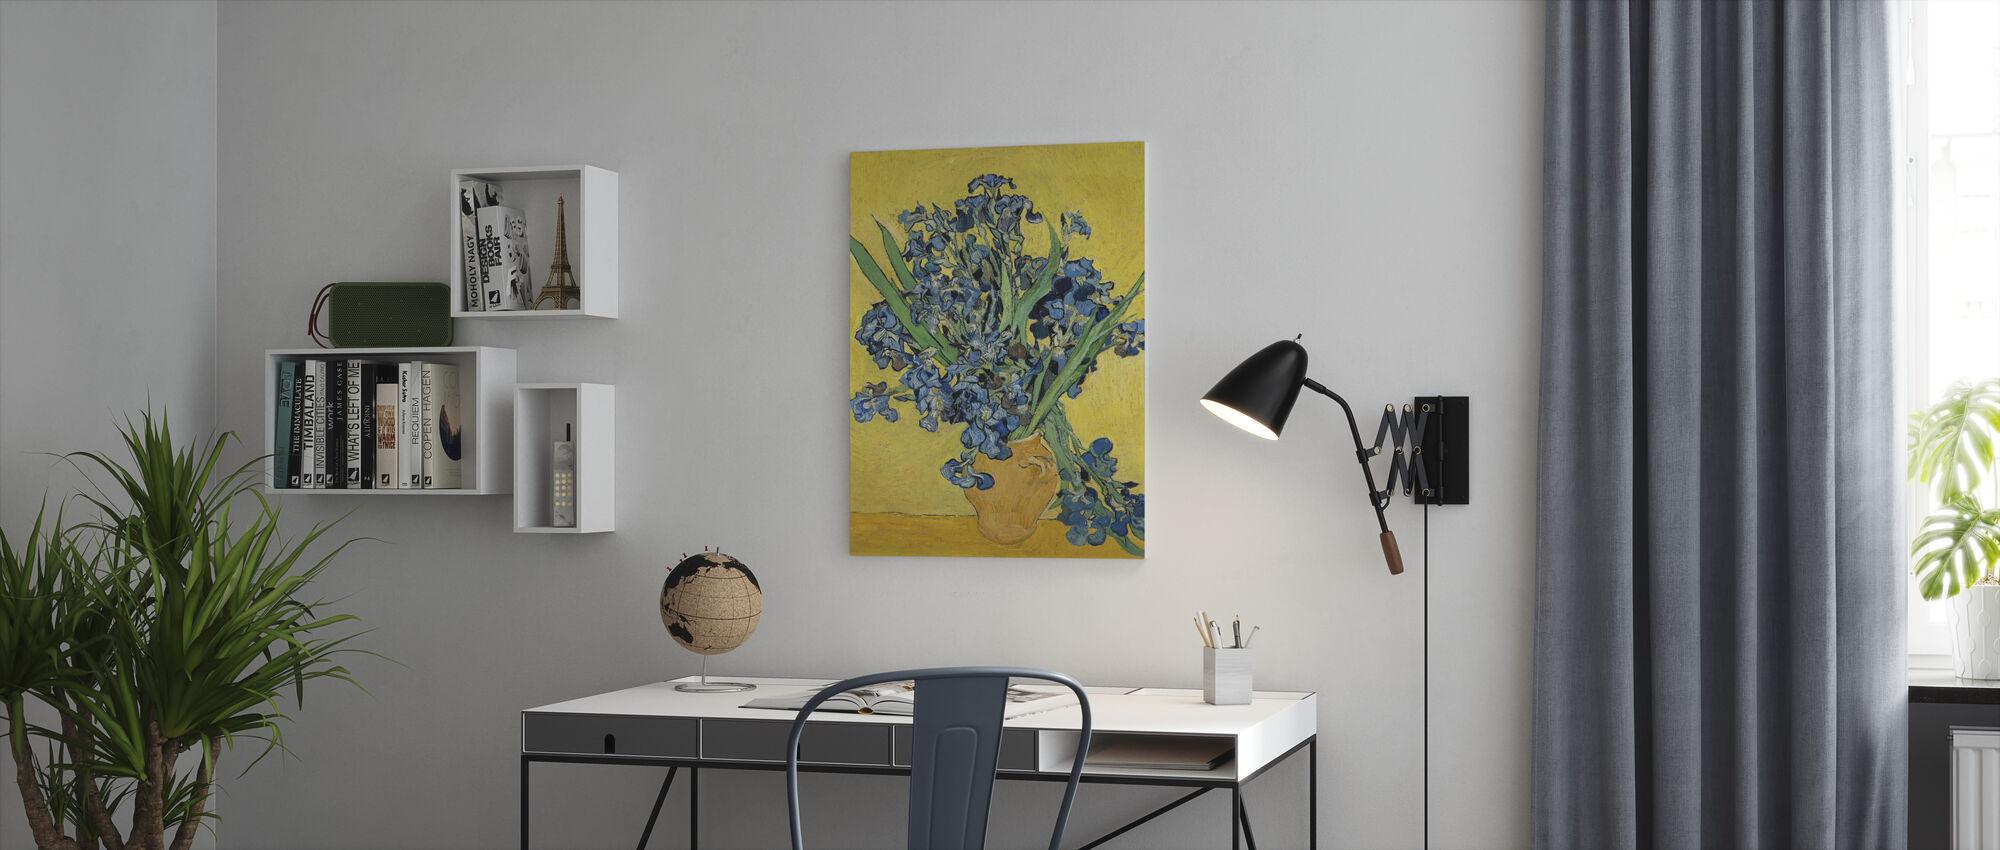 Irises - Vincent Van Gogh - Canvas print - Office